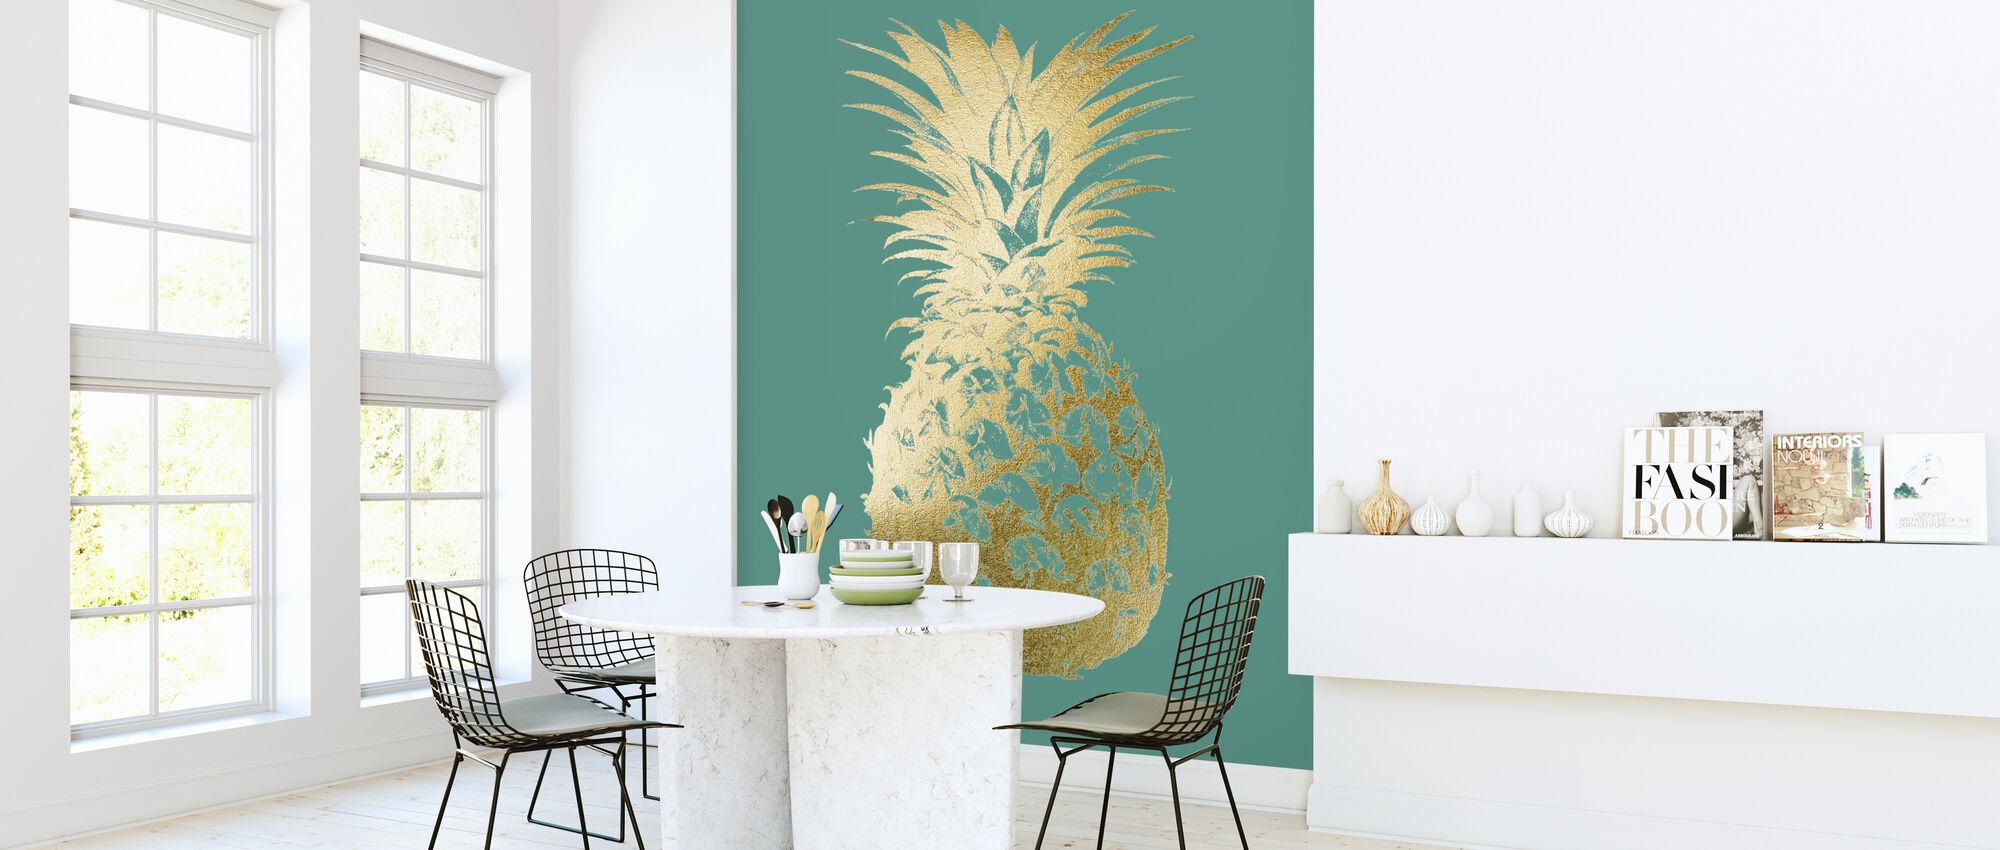 Piña en Esmeralda - Papel pintado - Cocina